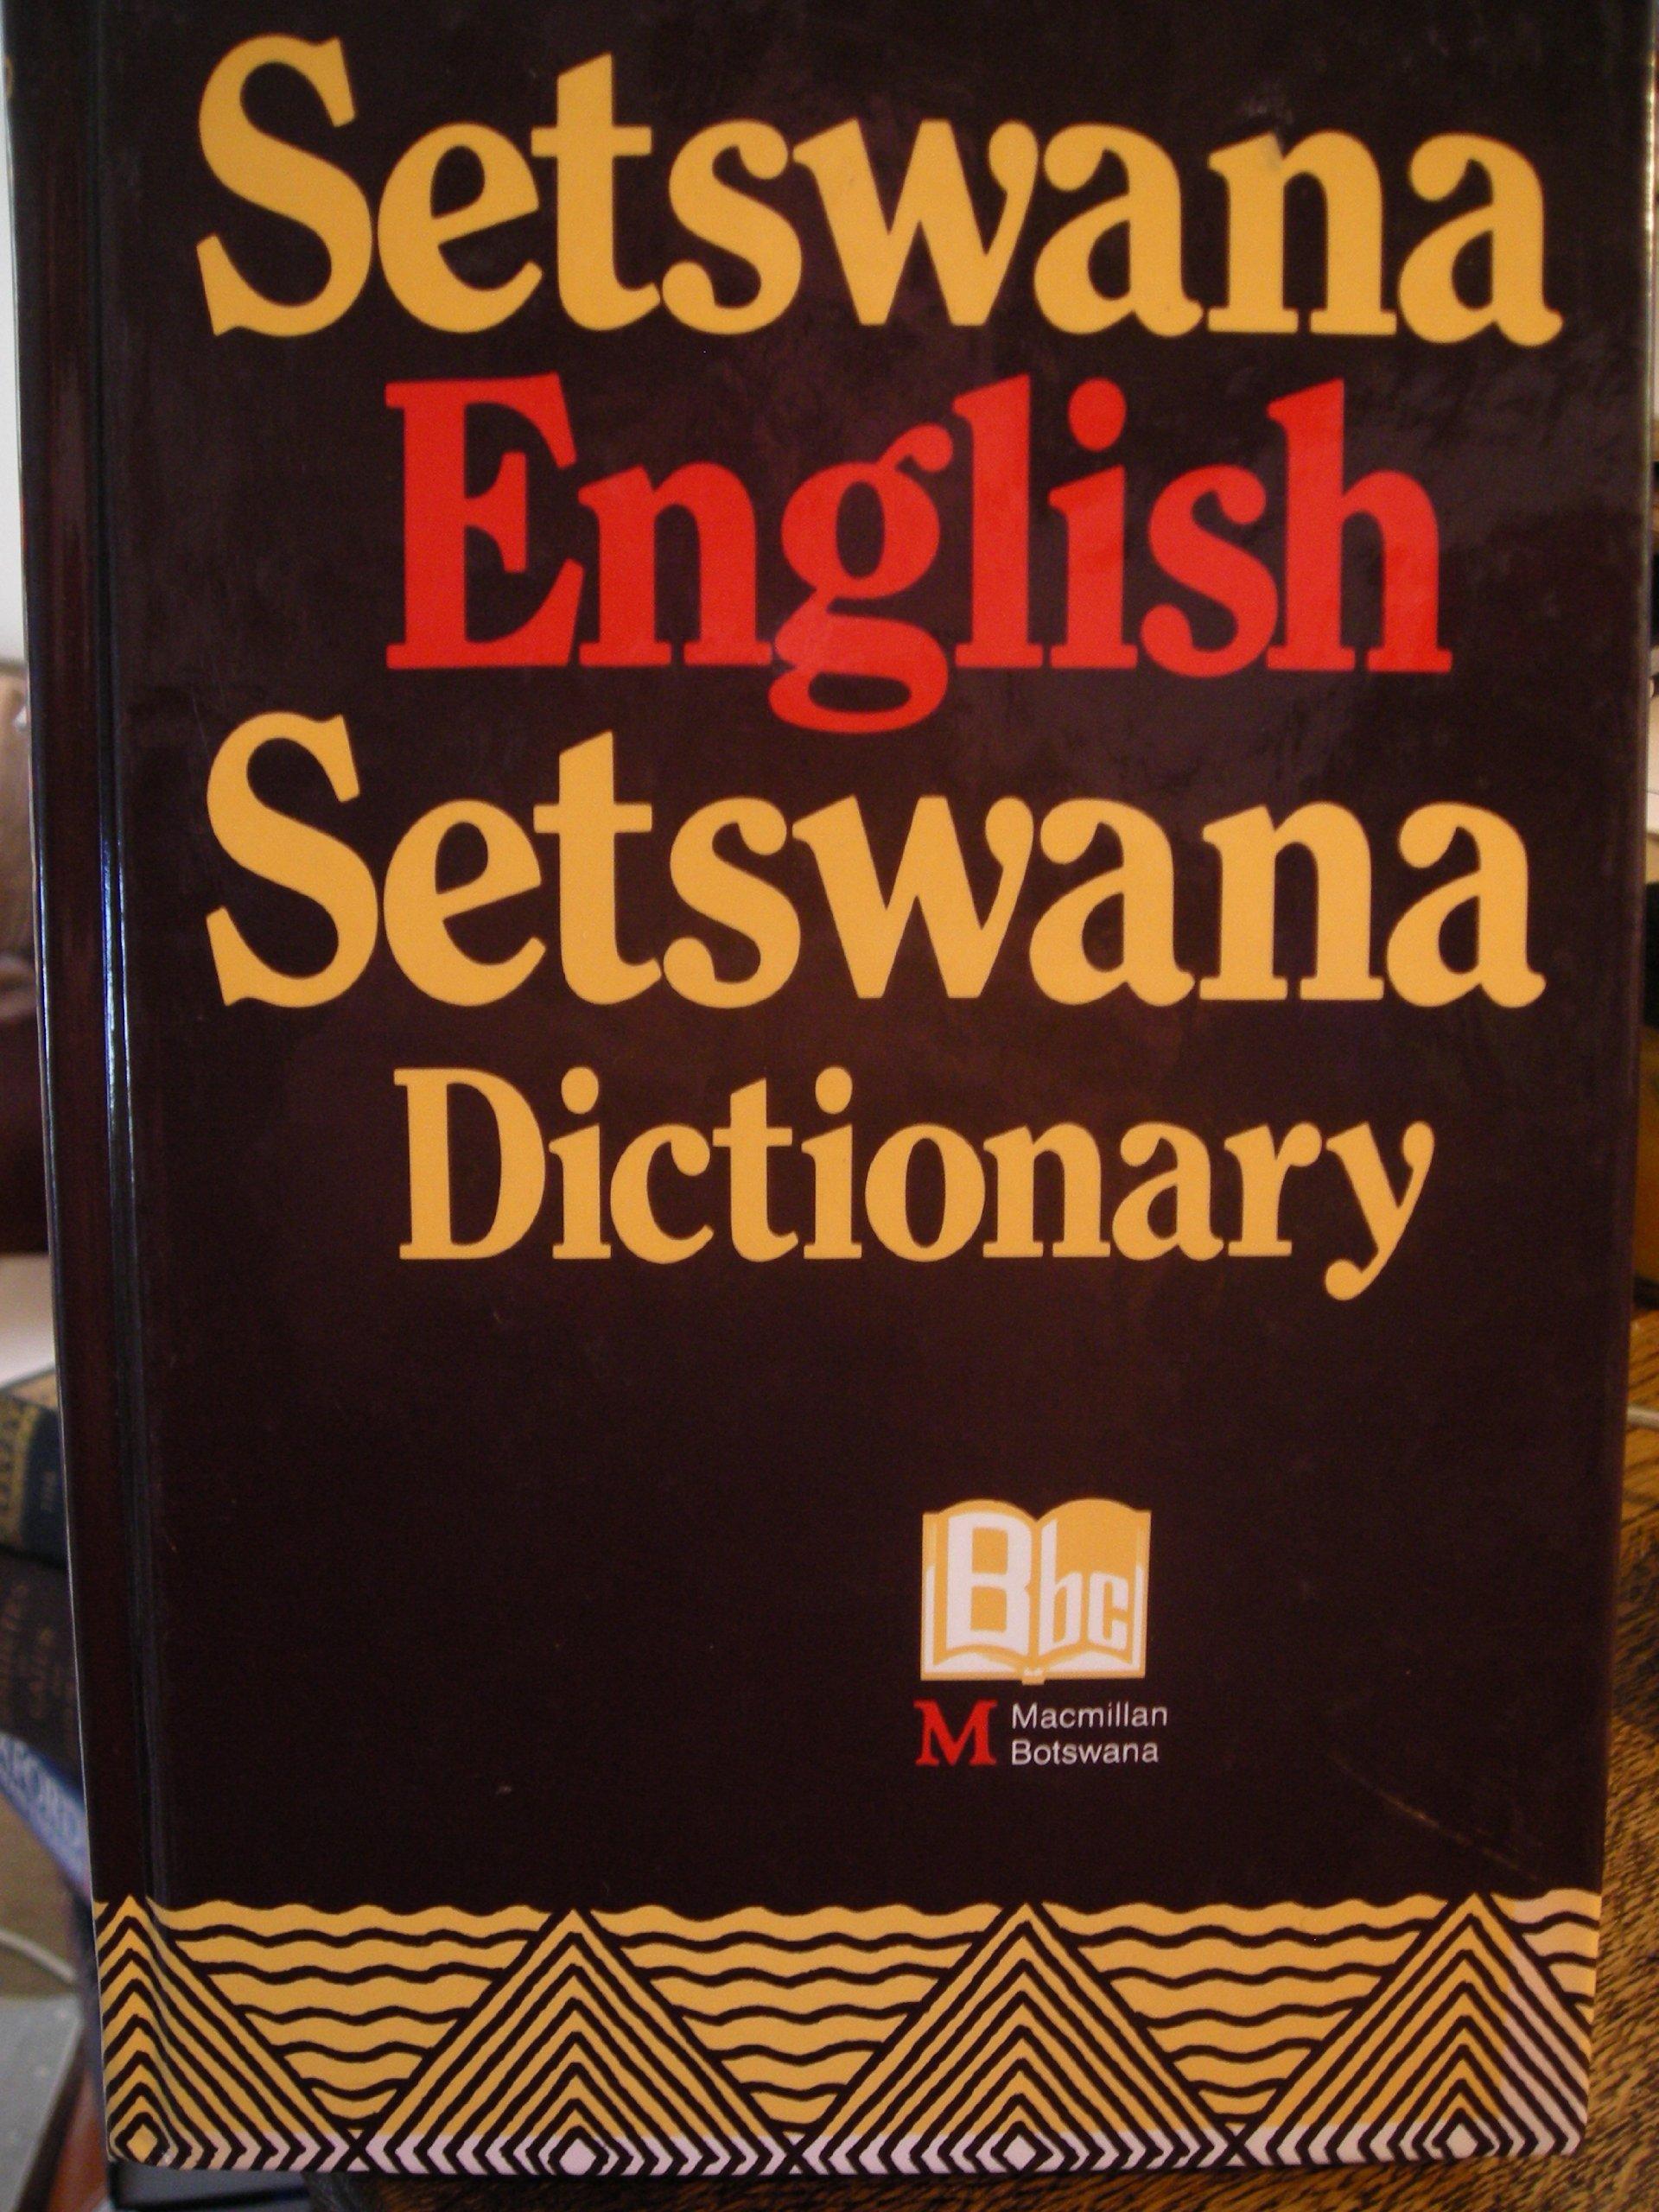 SETSWANA DICTIONARY EPUB DOWNLOAD